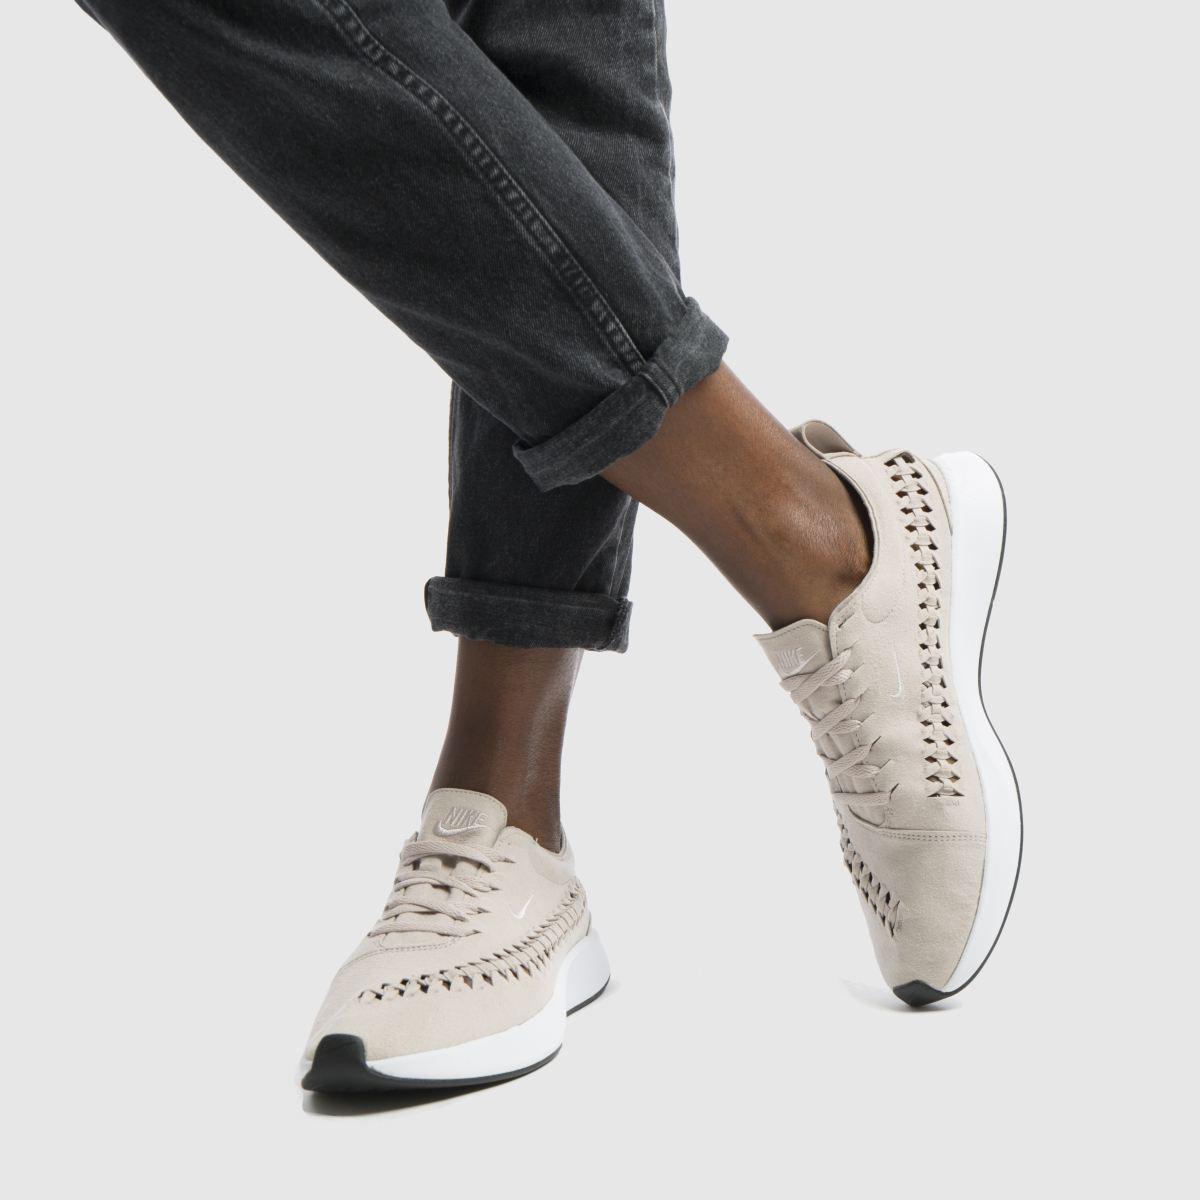 Damen Beige nike Dualtone Racer Woven Sneaker beliebte | schuh Gute Qualität beliebte Sneaker Schuhe cea2e7